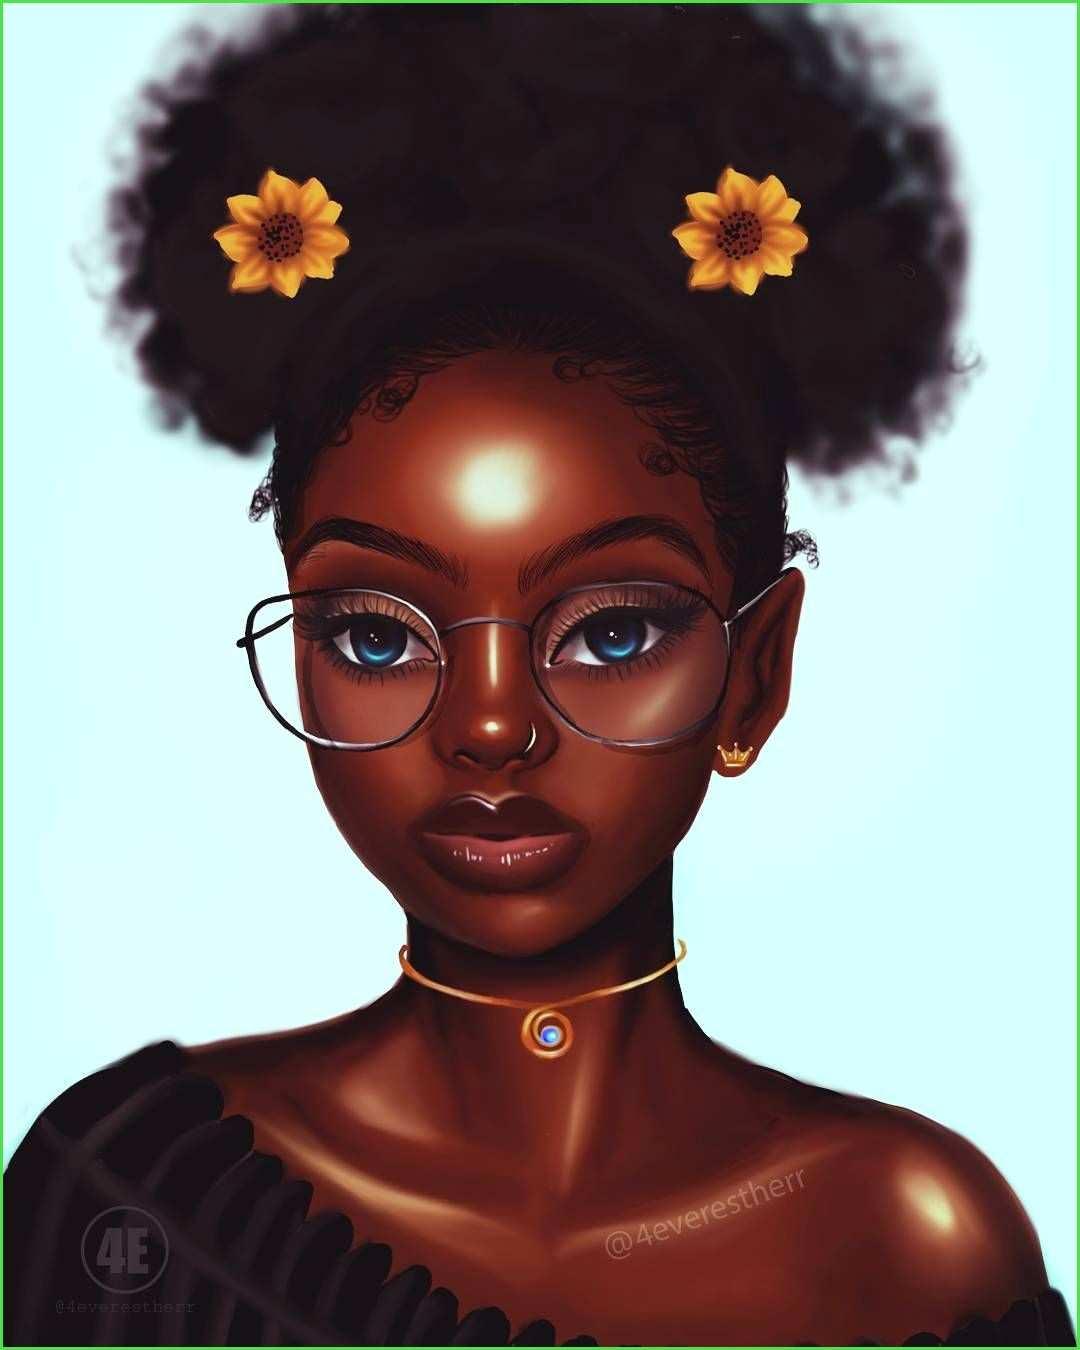 Black girl cartoon images